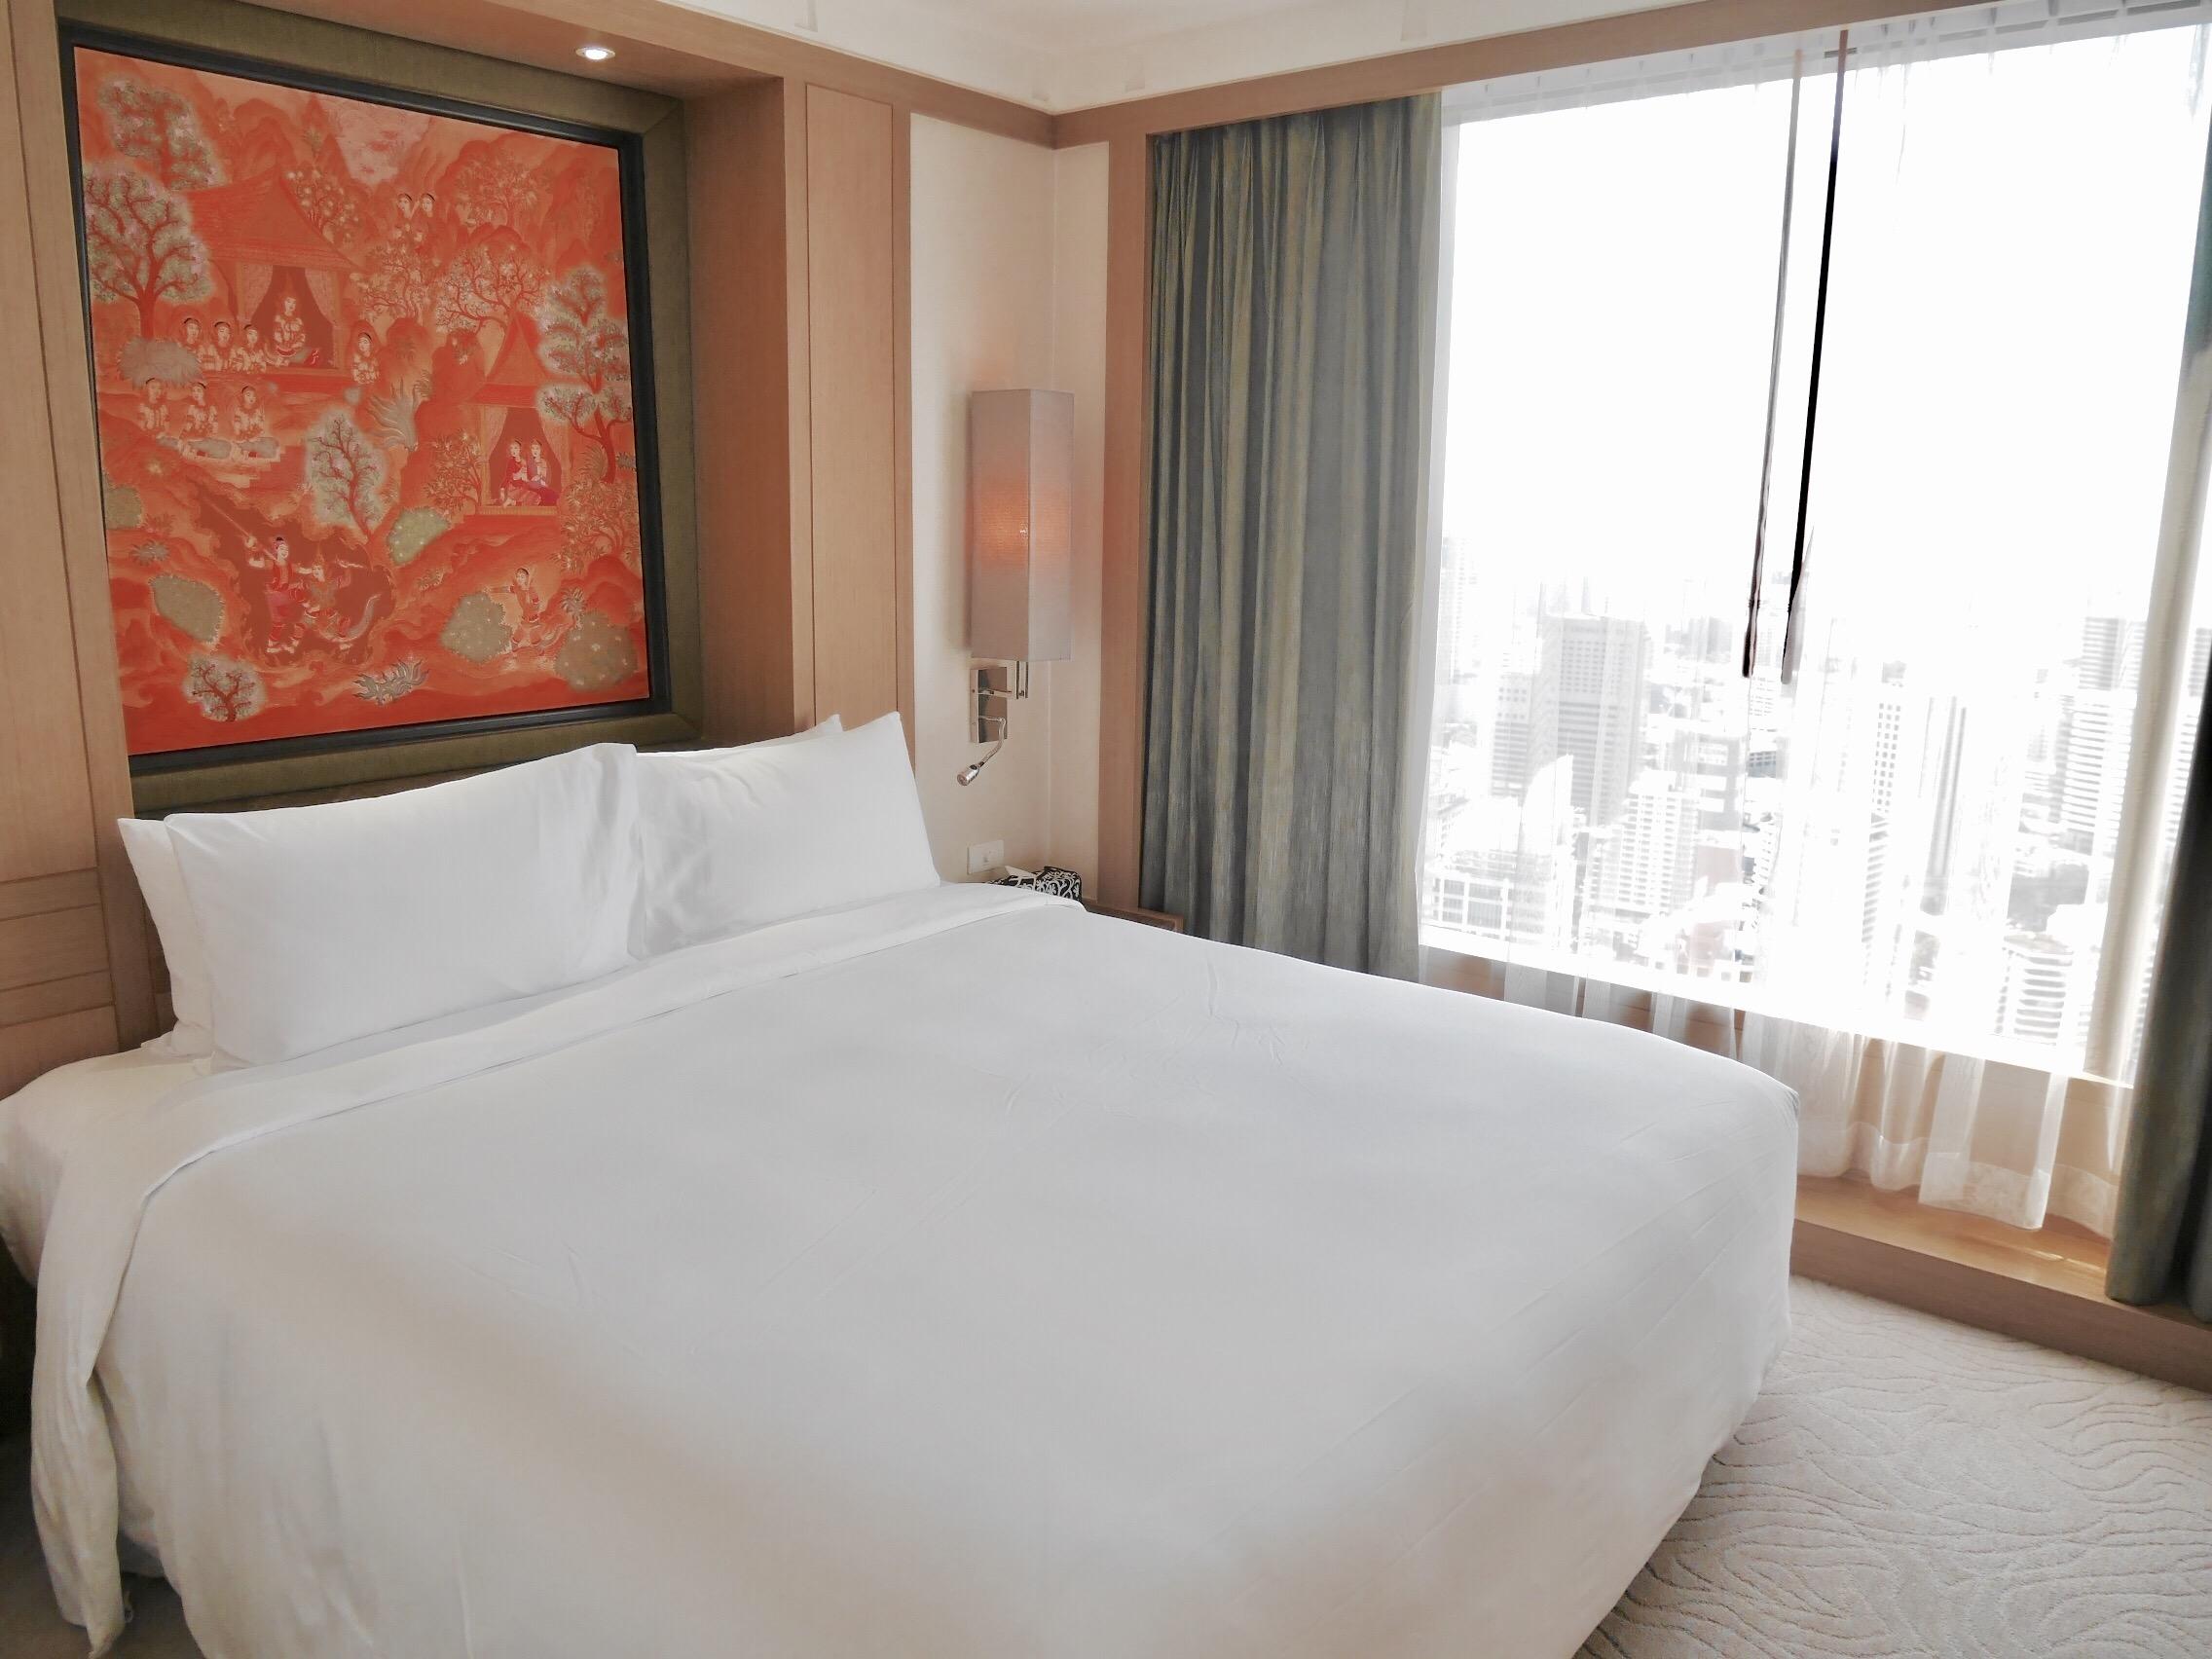 img 8205 - Banyan Tree Bangkok - 五つ星ホテルバンヤンツリーのSERENITY CLUBで過ごすリュクスな時間 「客室編」